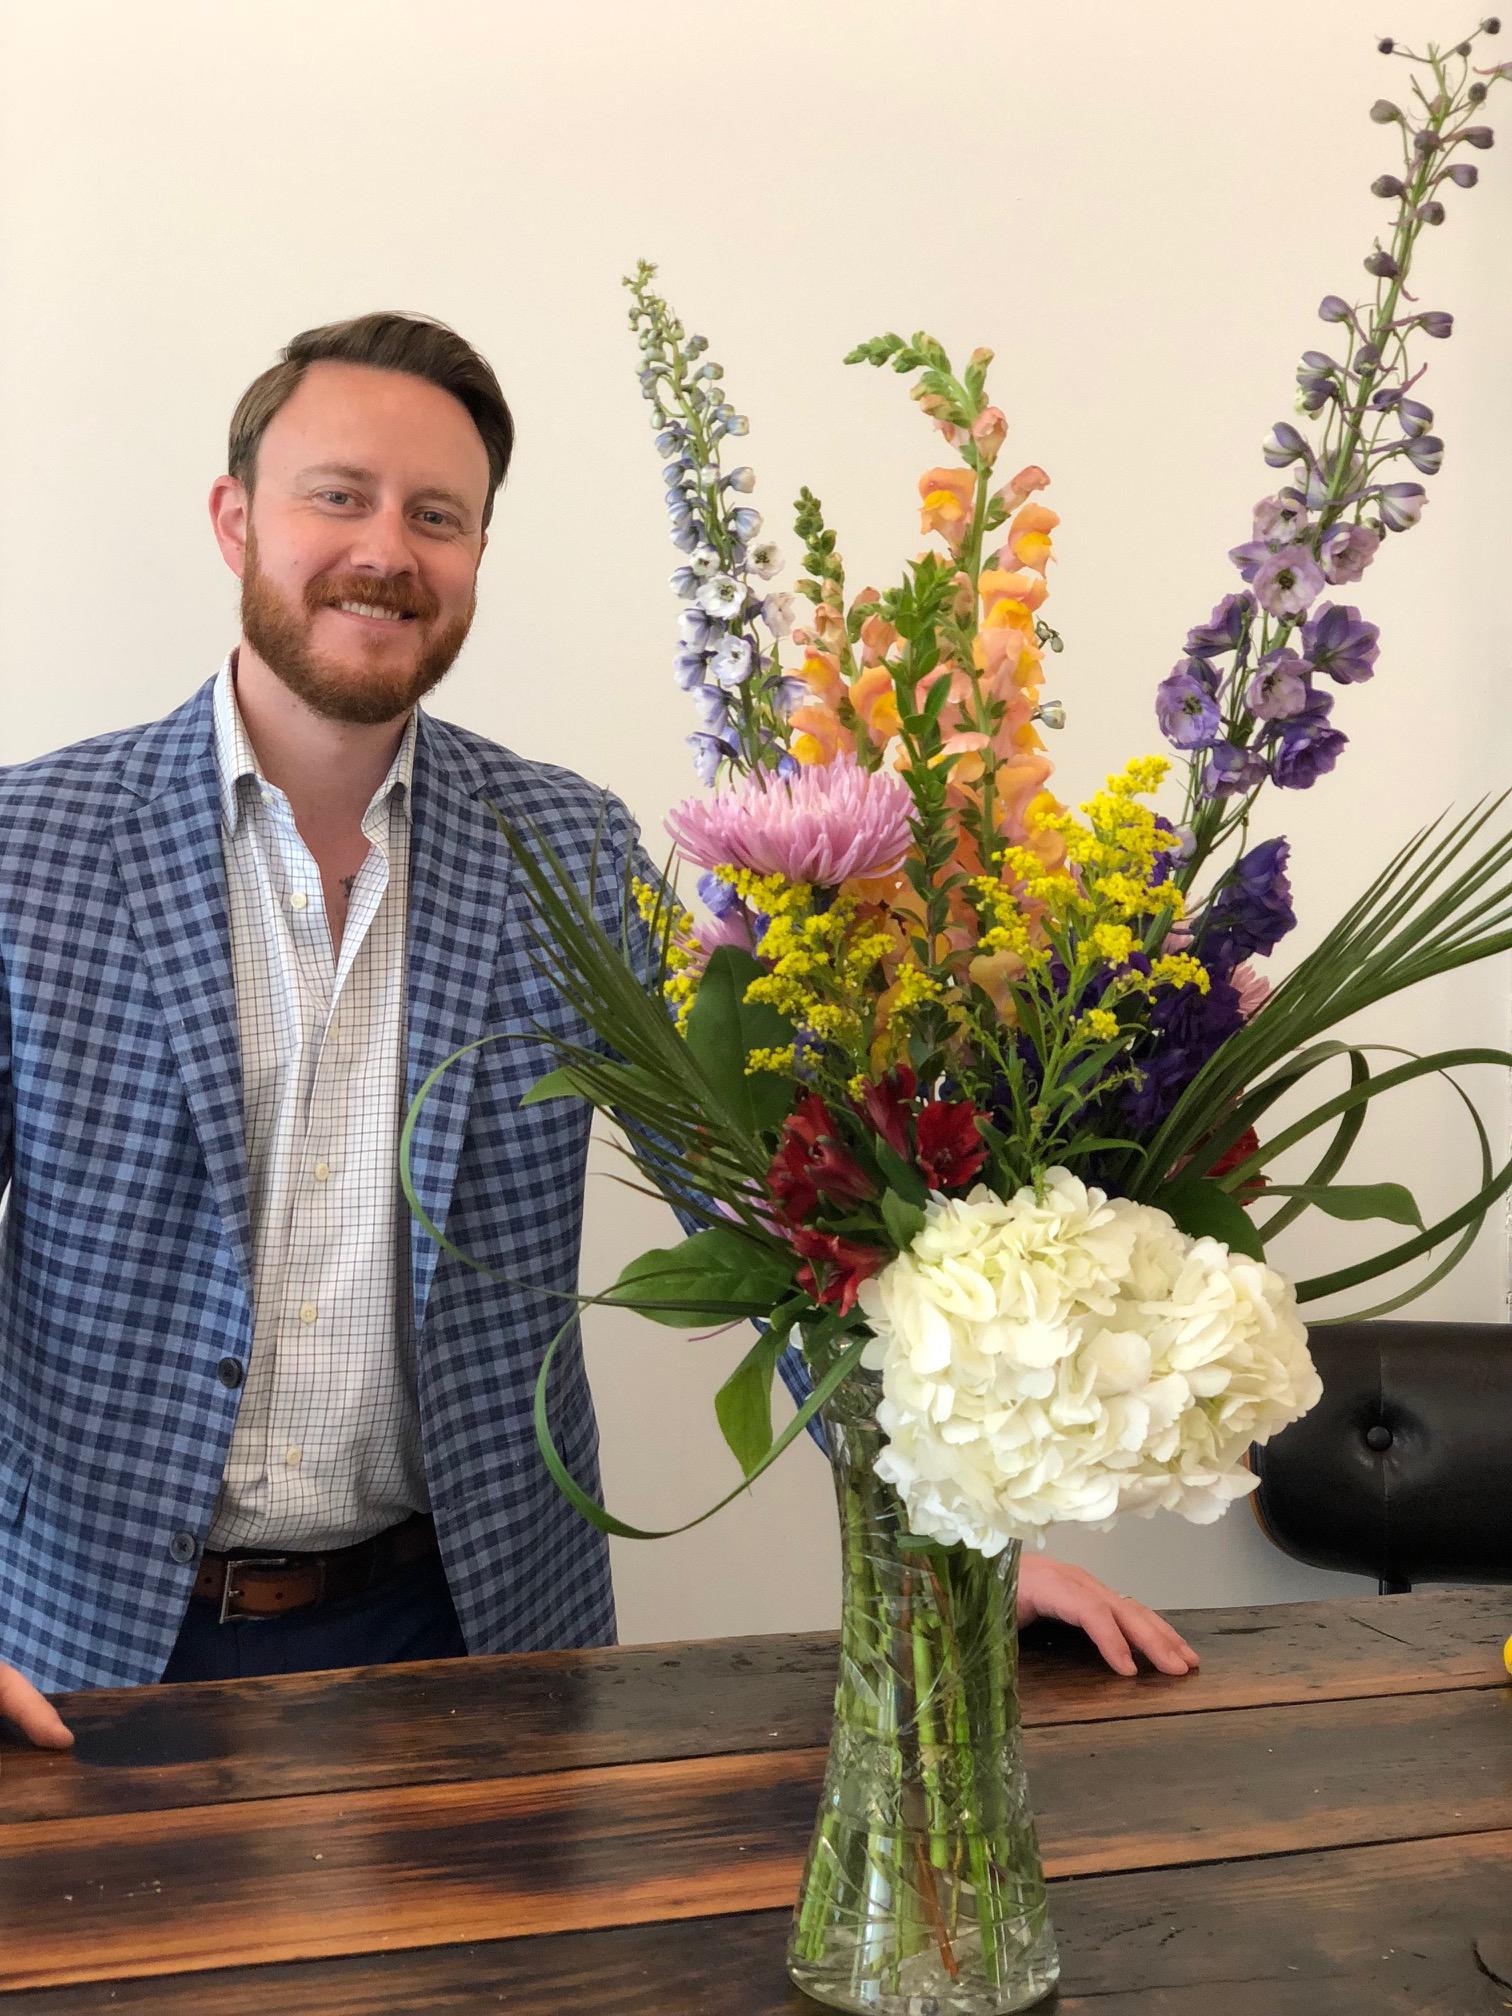 Jordan Fisher, Thelma's Flower shop